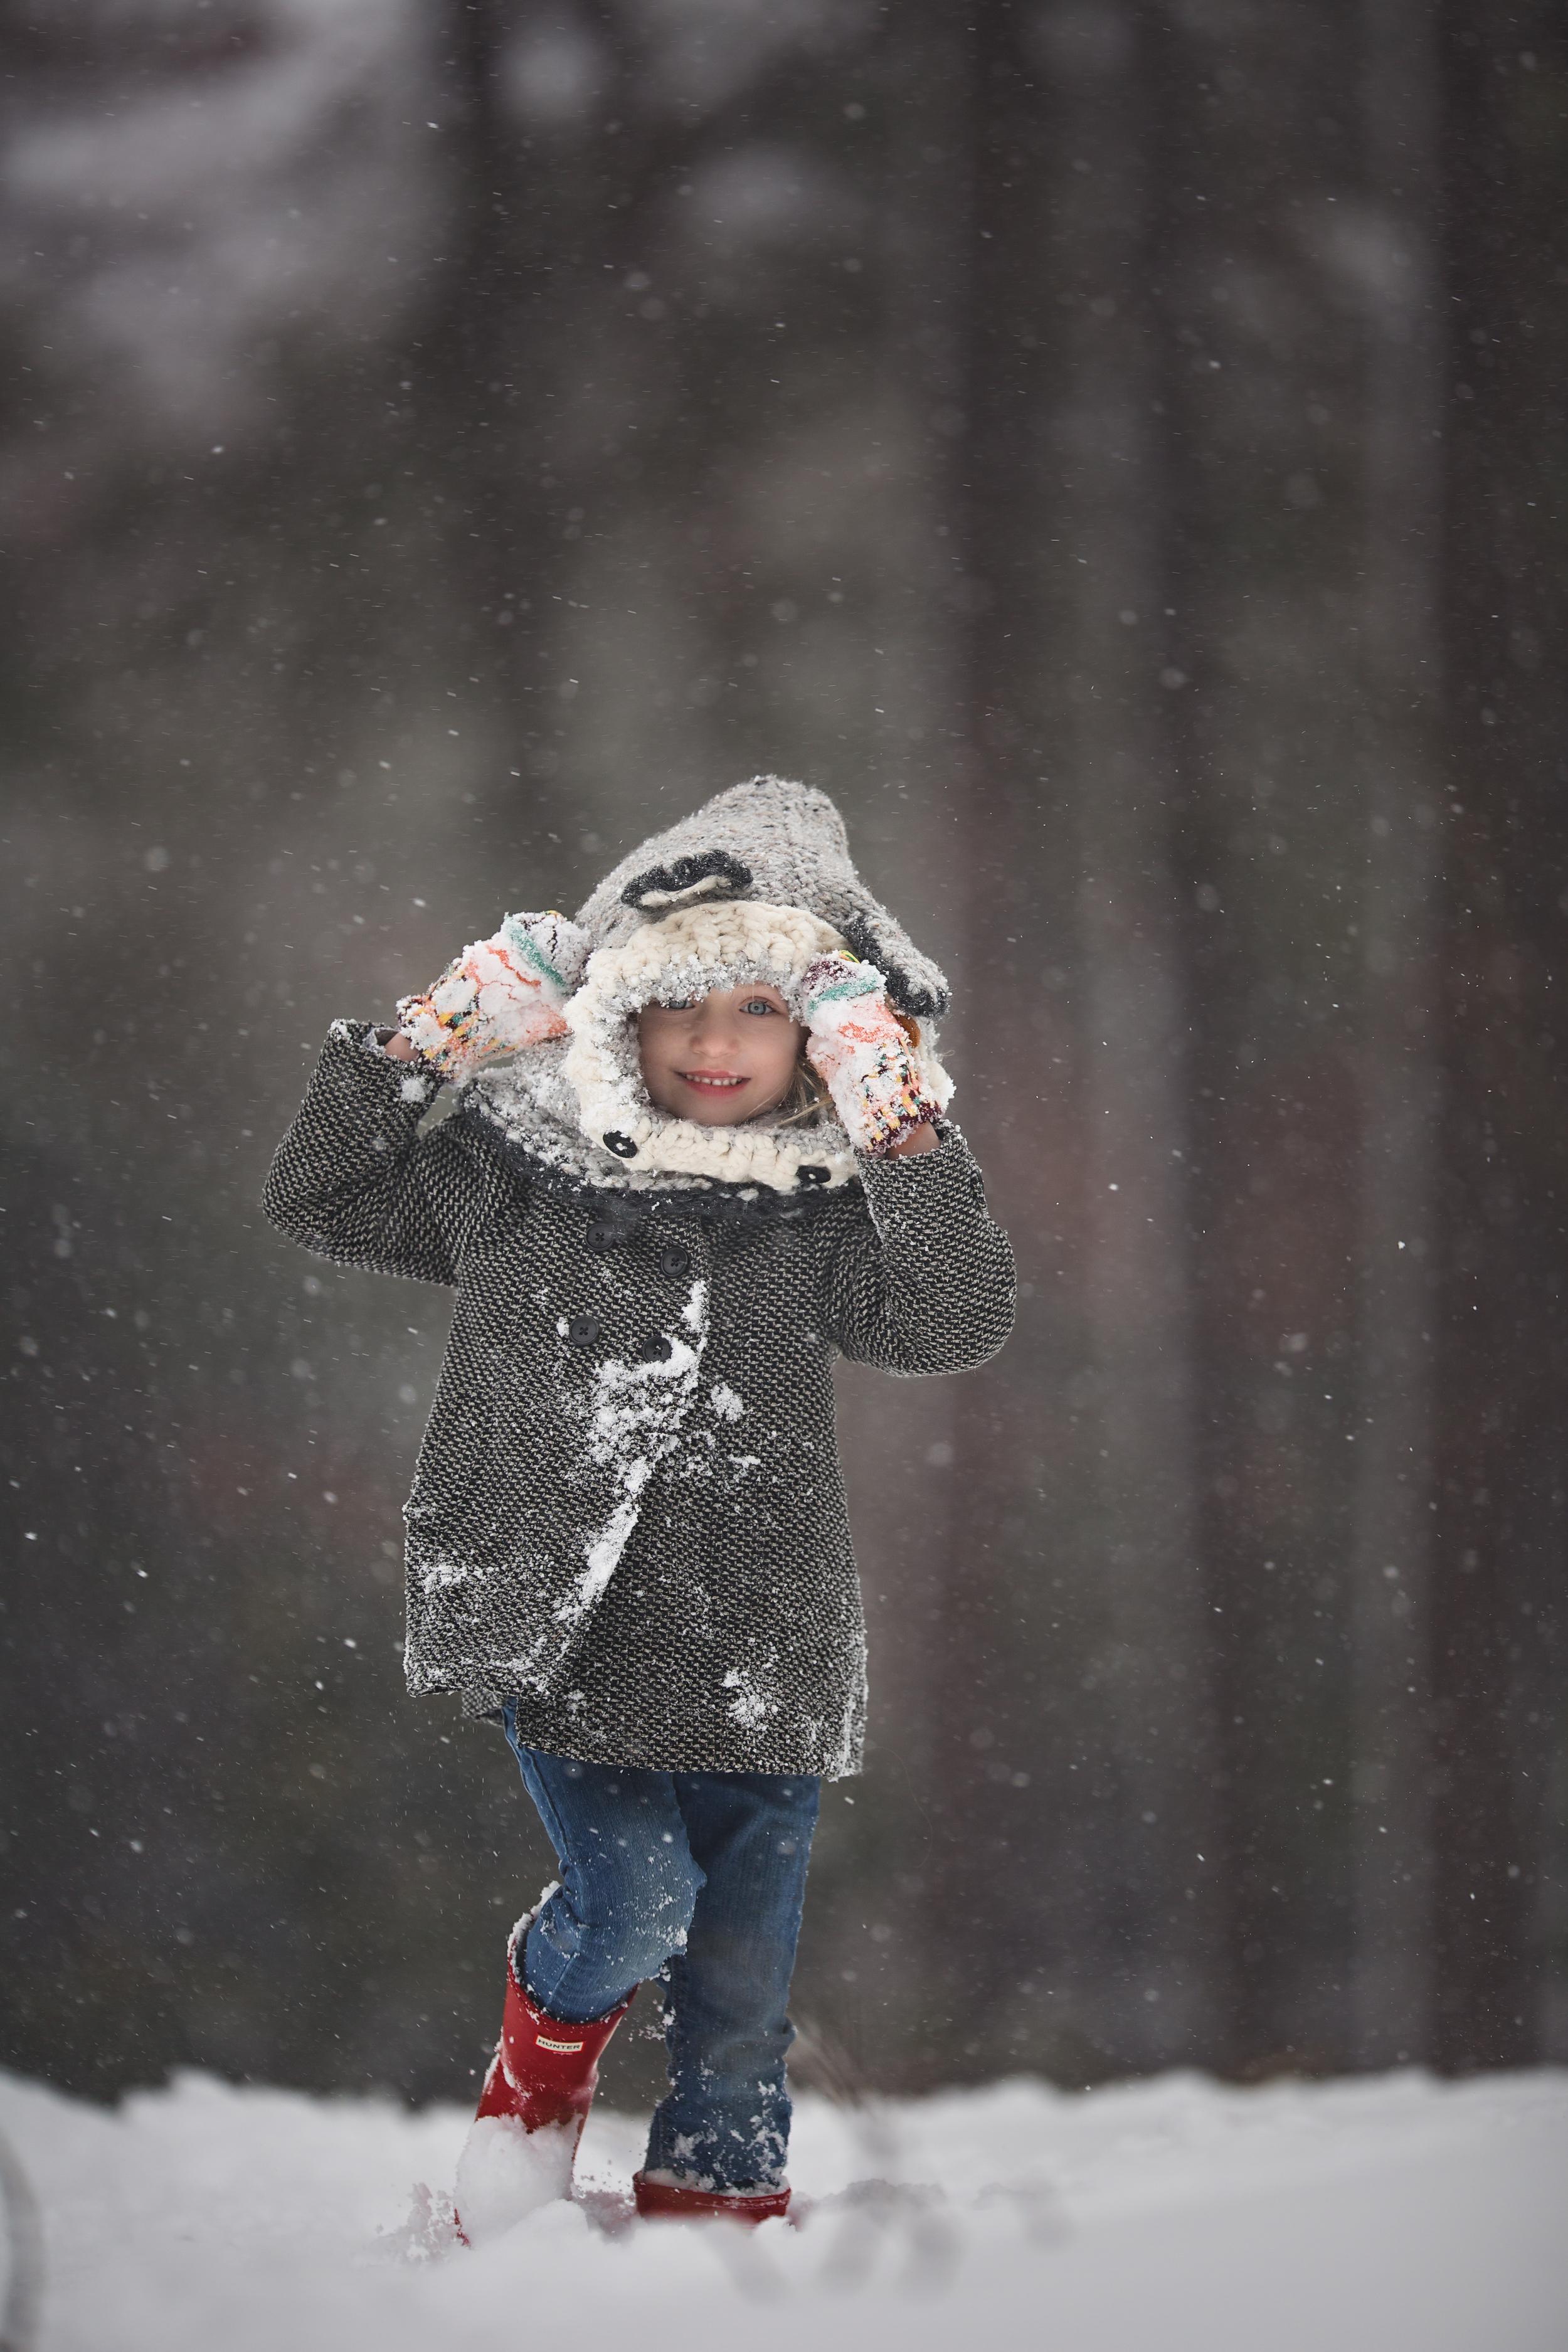 Hello-Olivia-photography-Long-Island-snow-blizzard-play-ice-cold